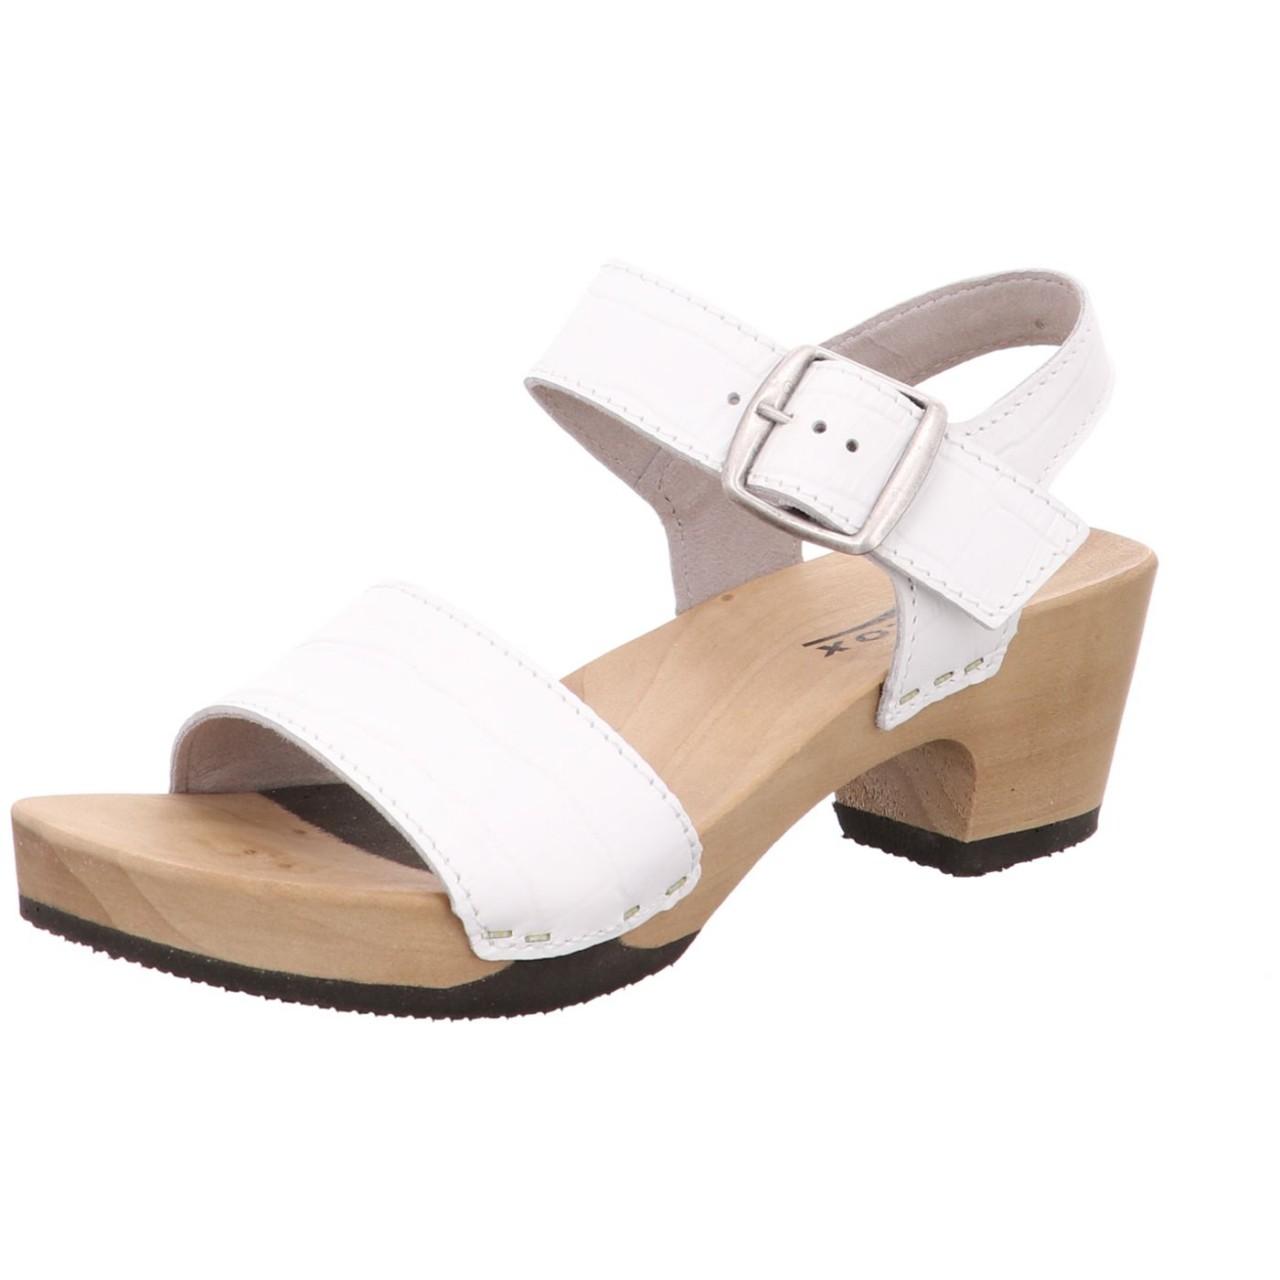 Softclox Sandale Kea Weiß 3380 weiss